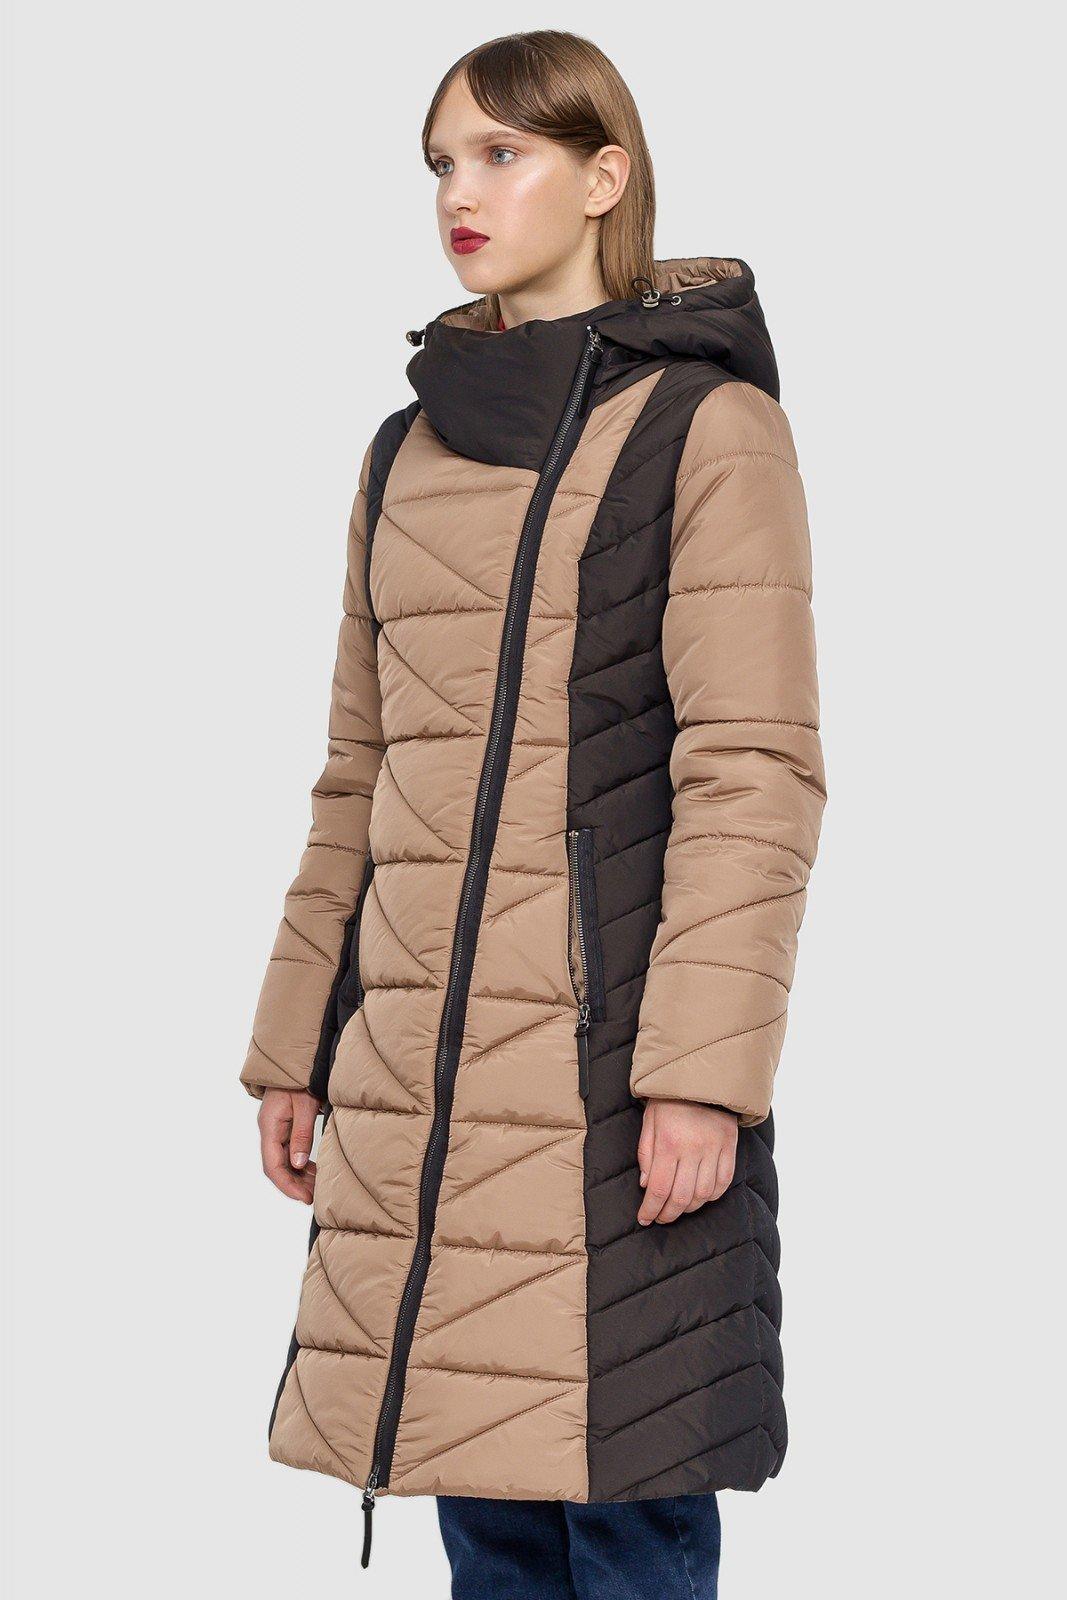 Куртка Лейтон 2